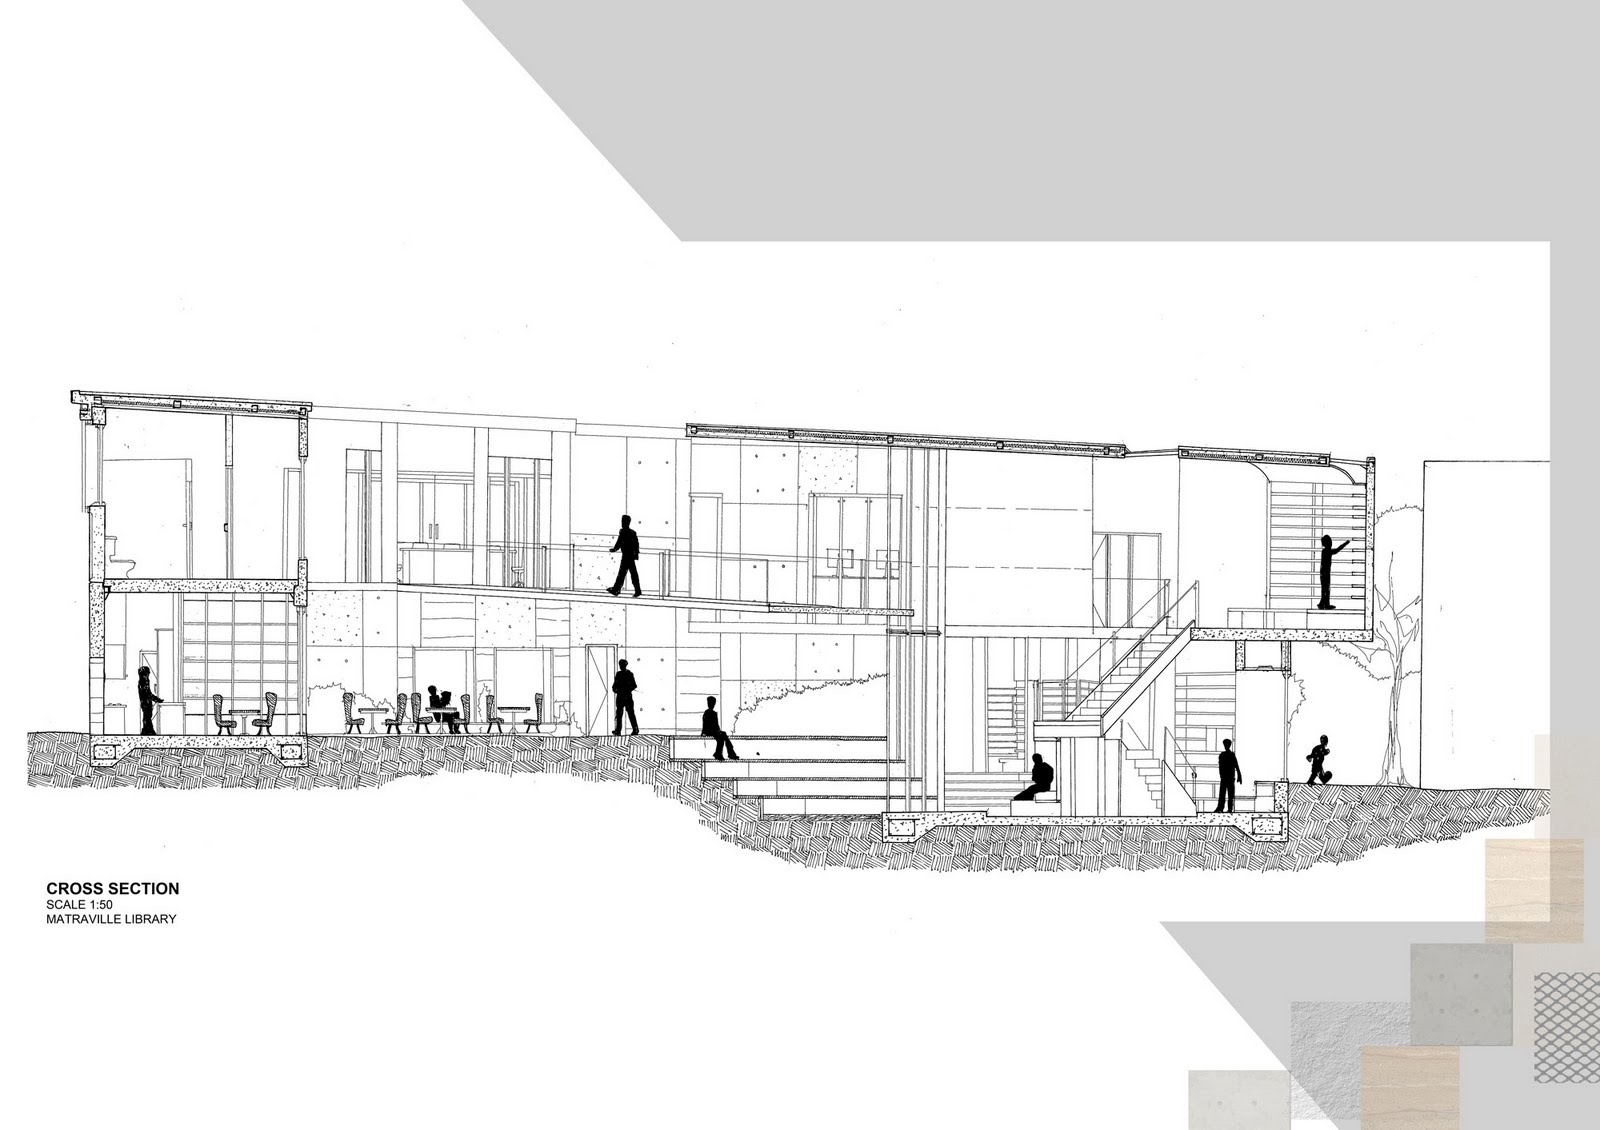 Merveilleux Architectural Studies